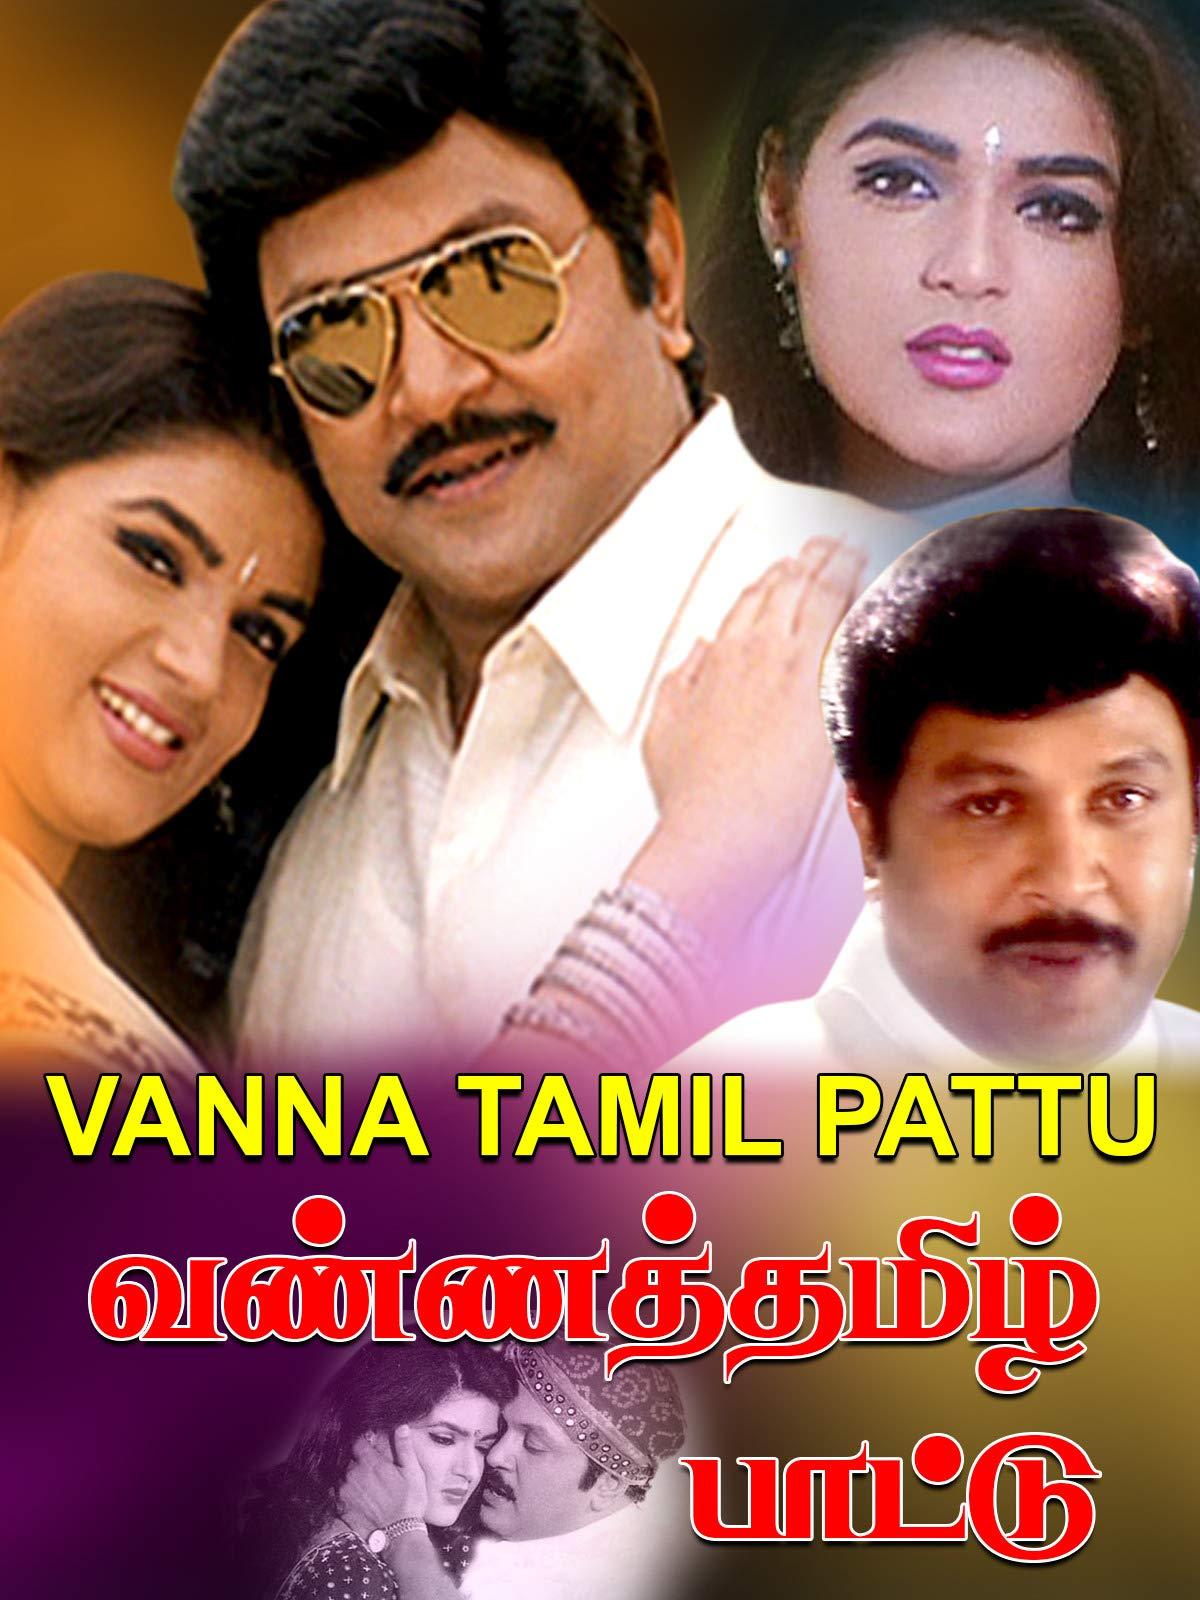 Vanna Tamil Pattu